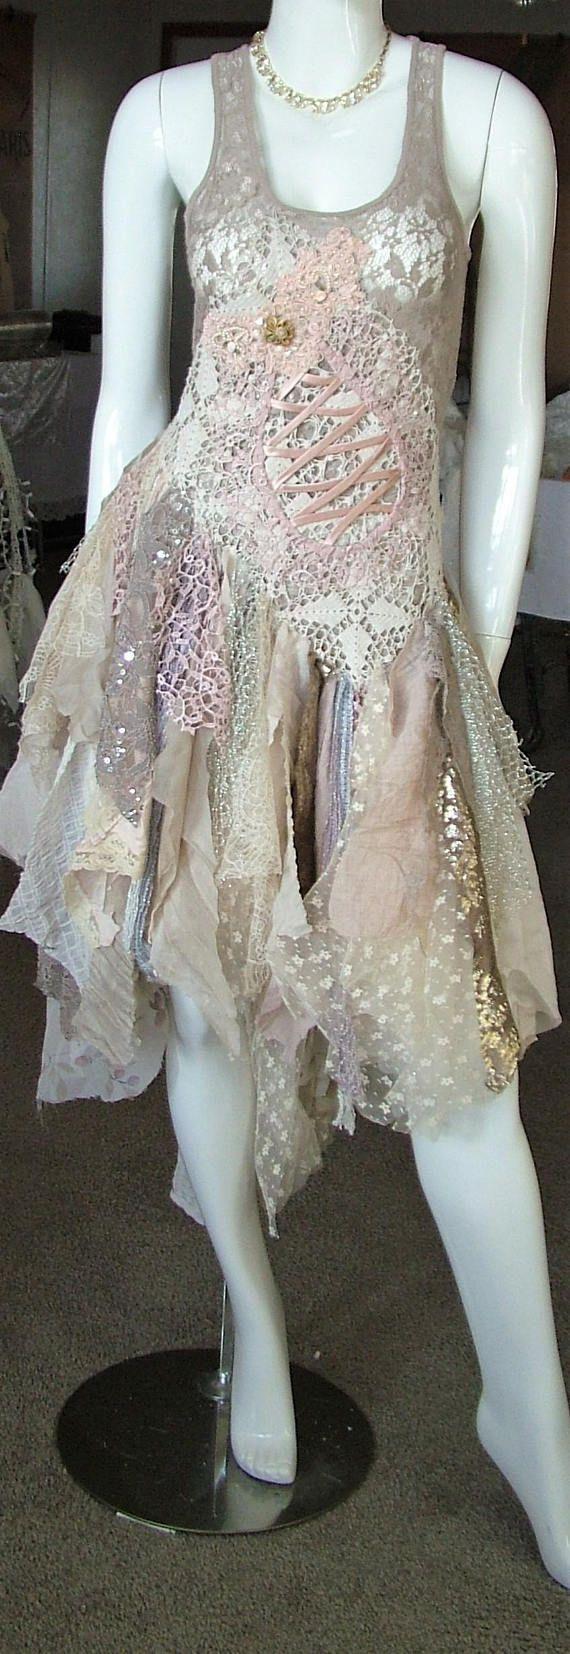 #vintageinspired  #ivory #weddingdress #brown #pink #ivory #oneofakind #unique #alternative